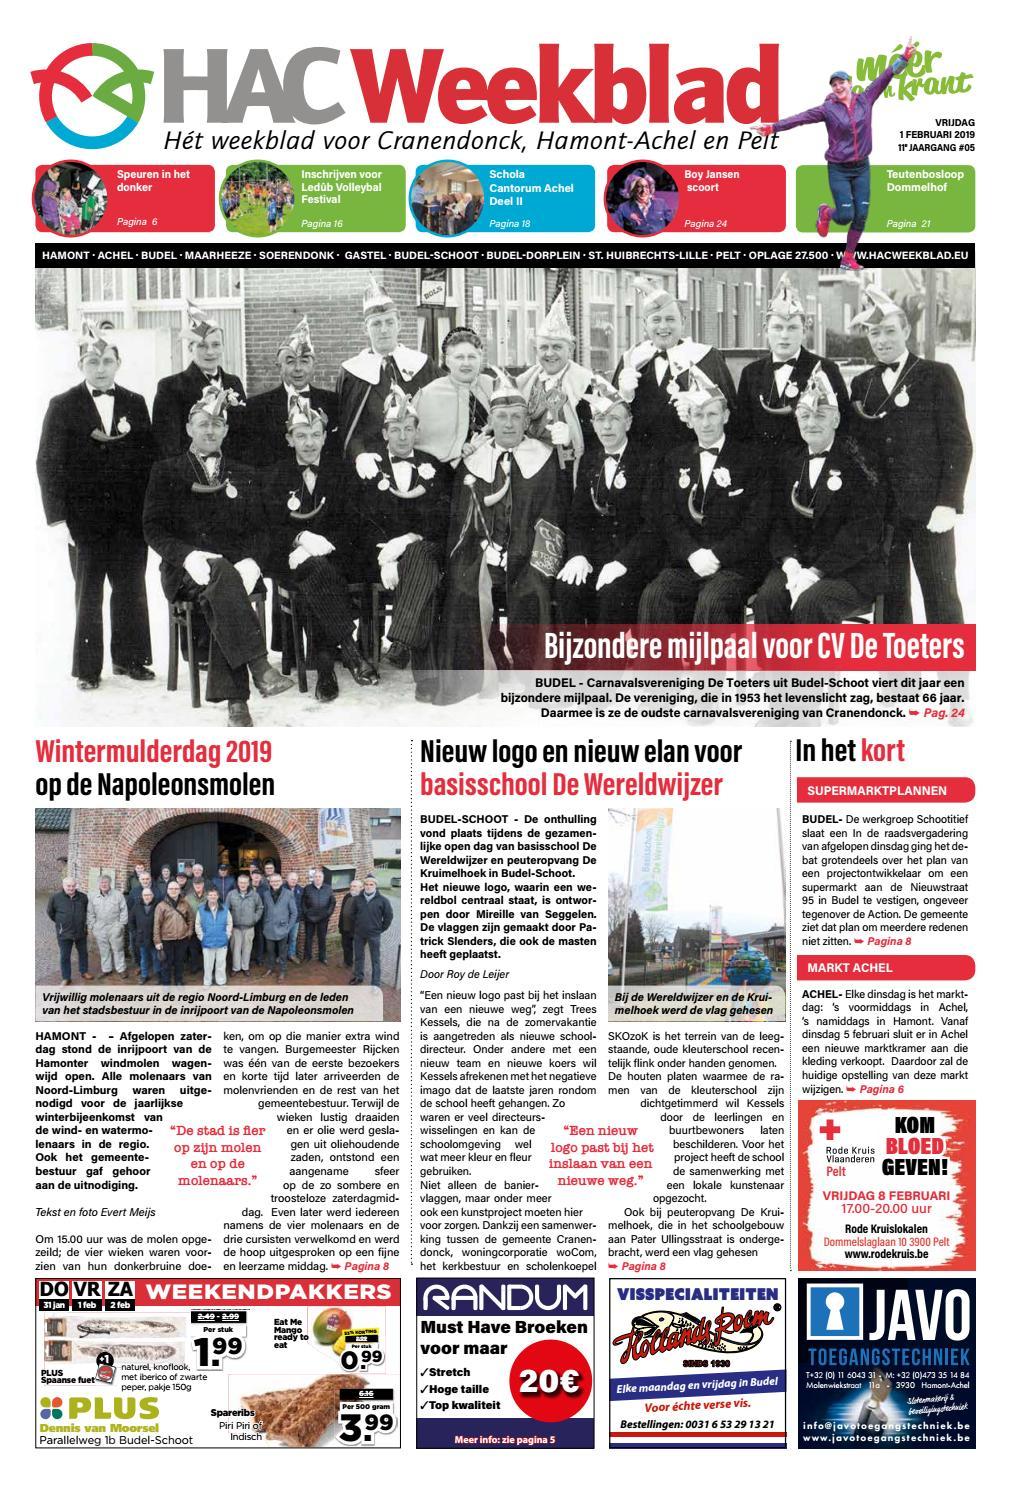 95ba8a8736b HAC Weekblad week 05 2019 NL by HAC Weekblad - issuu